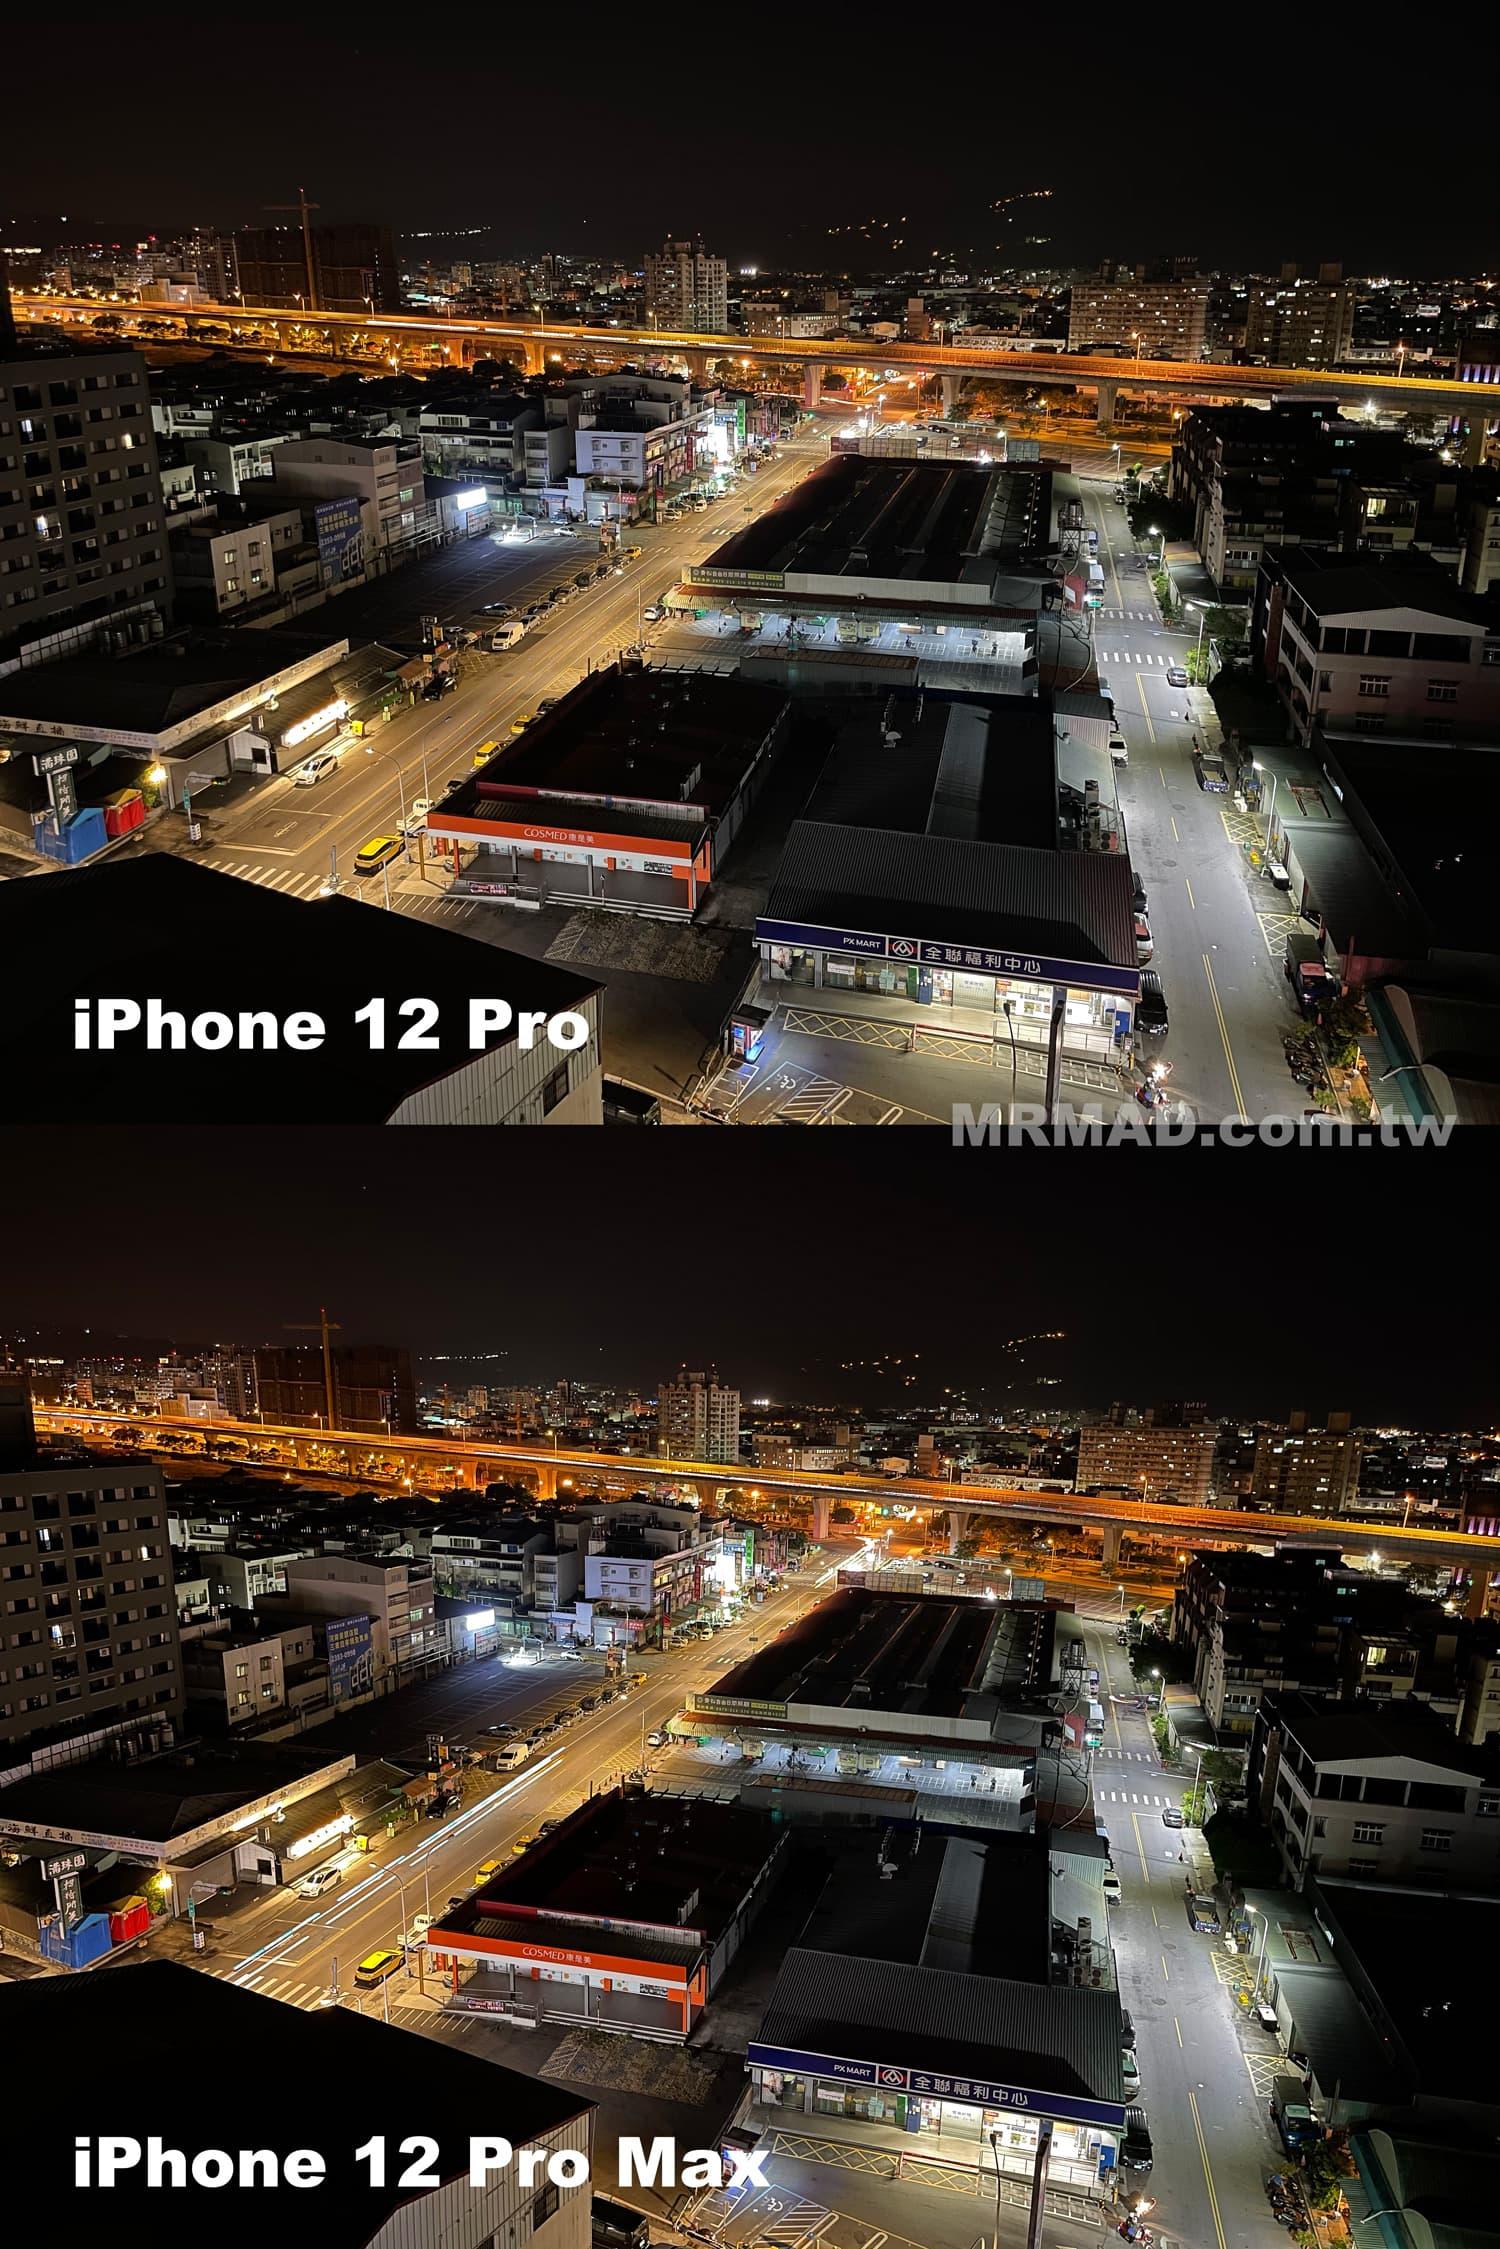 iPhone 12 Pro Max vs. iPhone 12 Pro 夜拍比較1